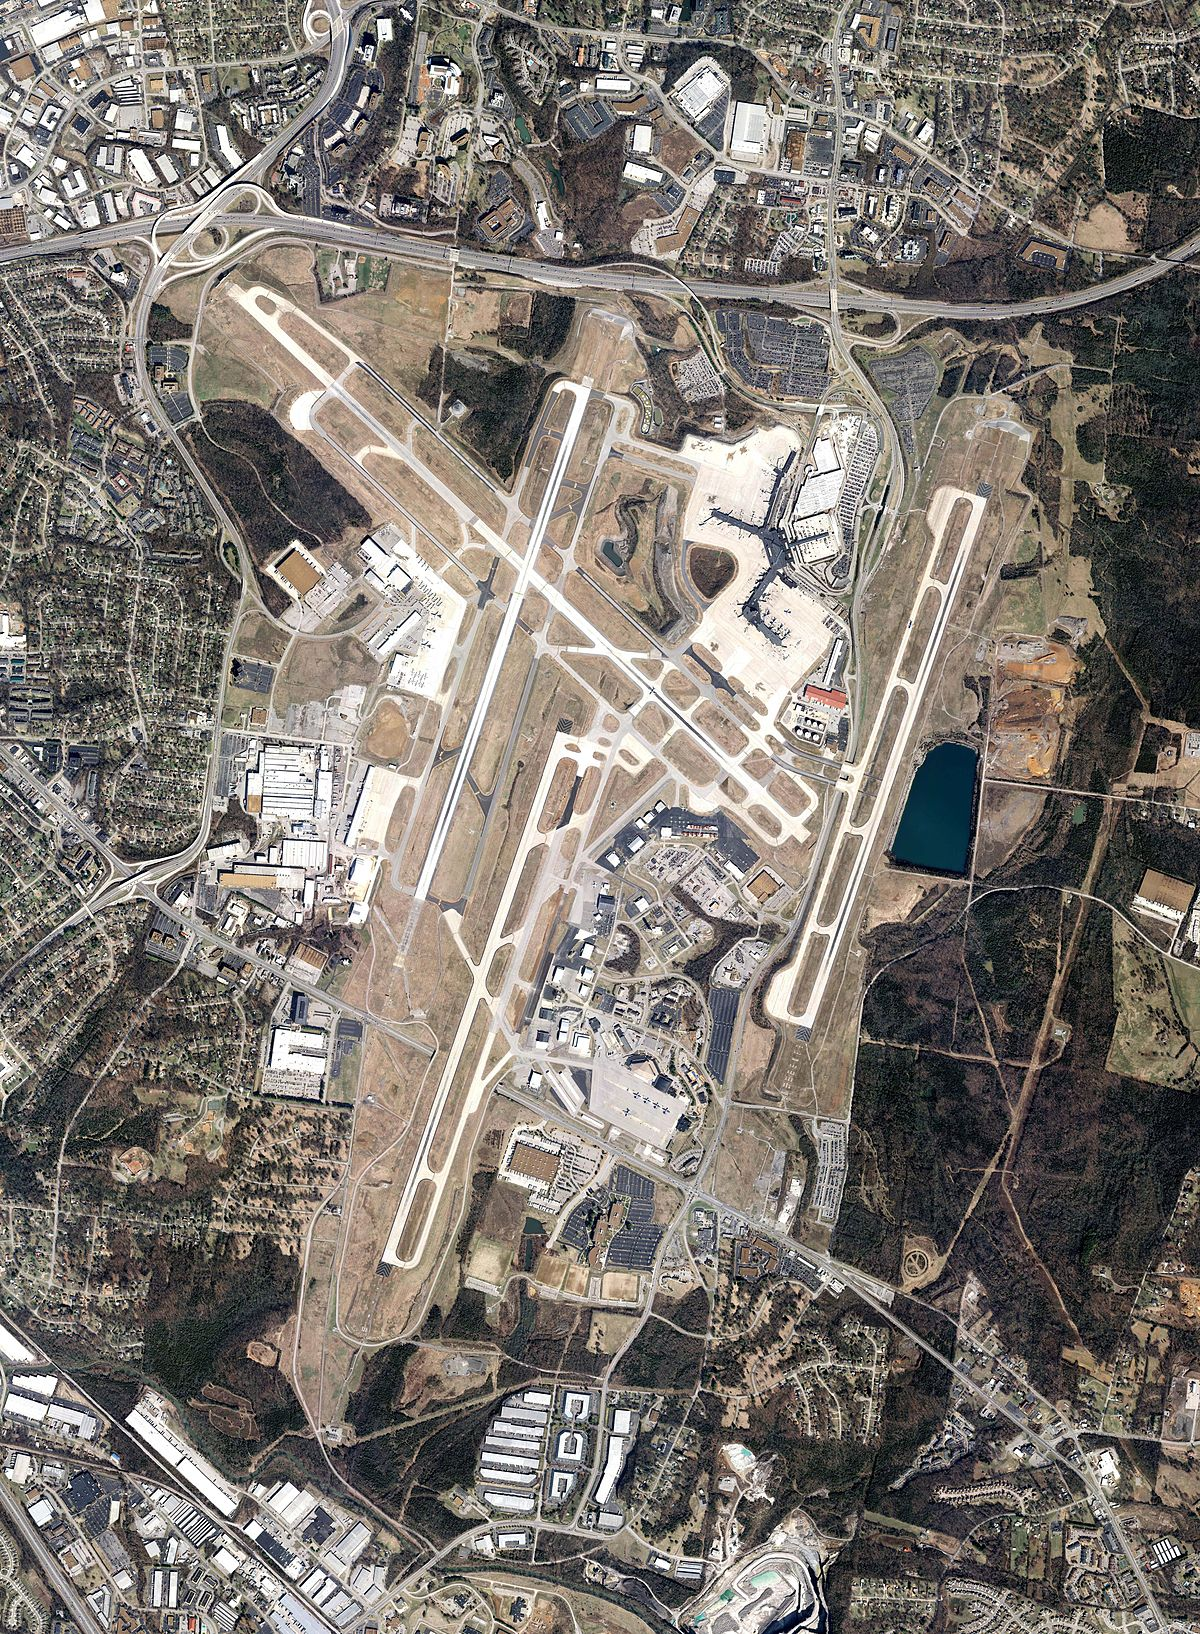 Nashville International Airport Wikipedia